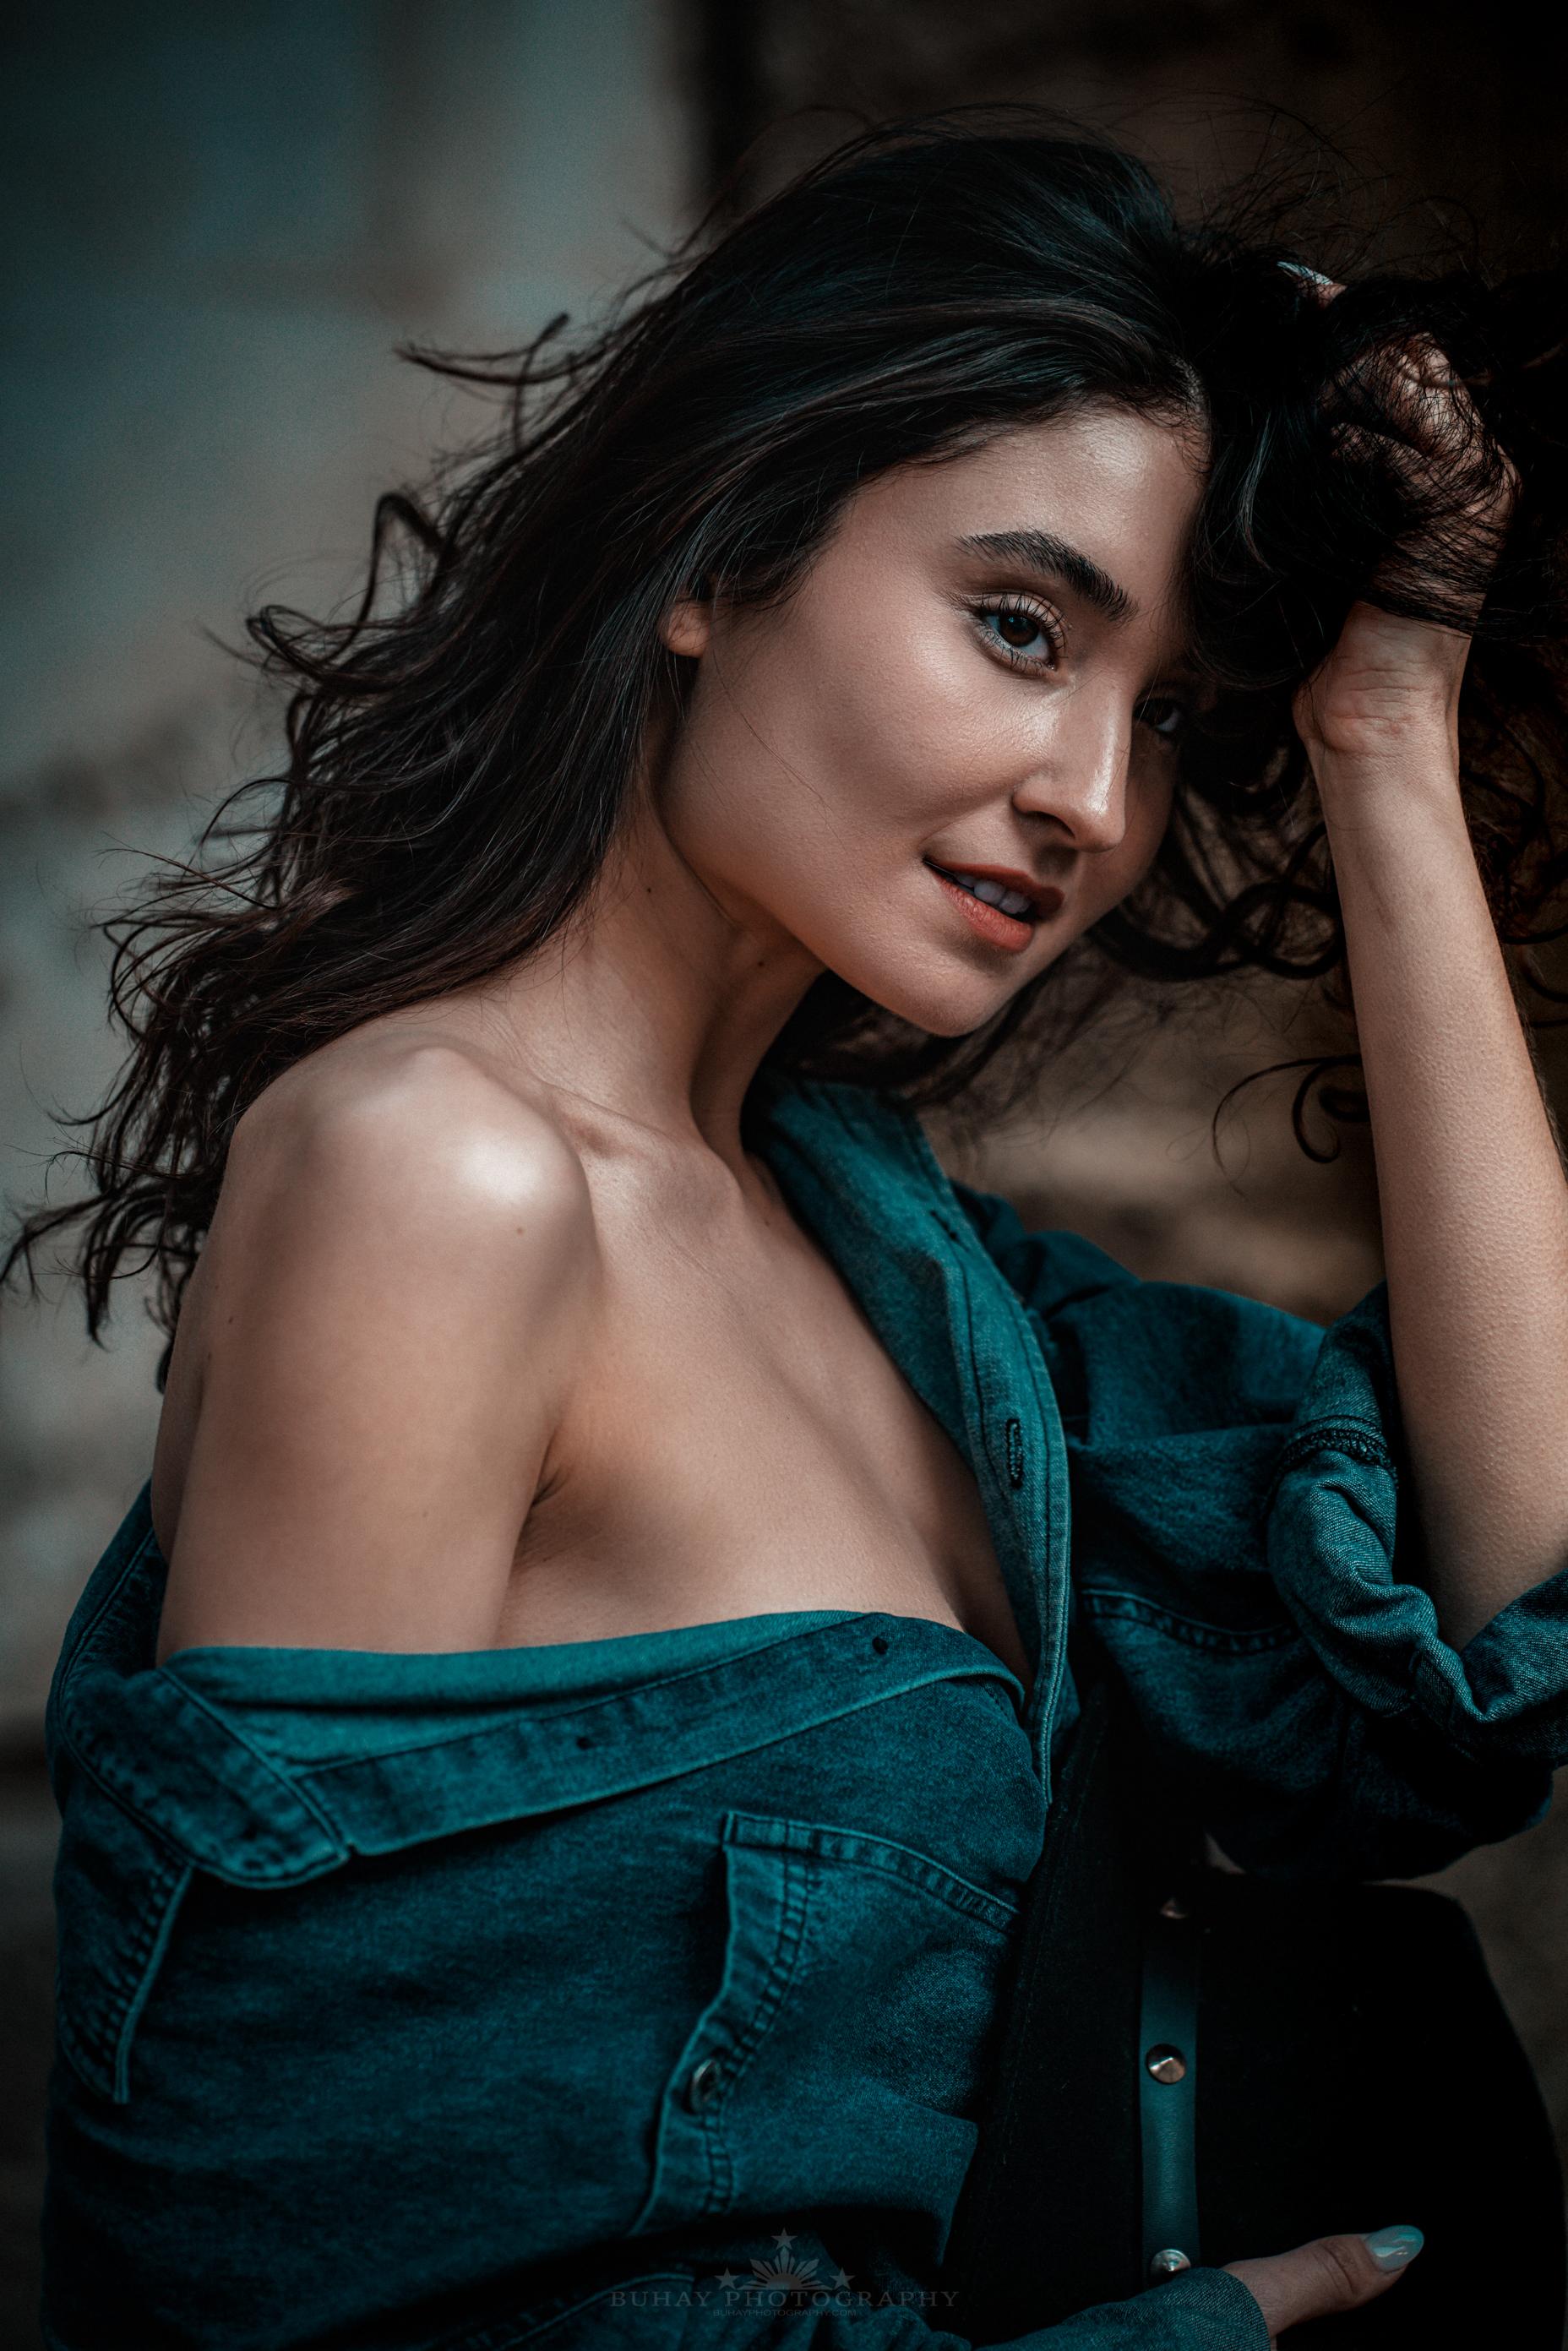 Buhay Photography 2019